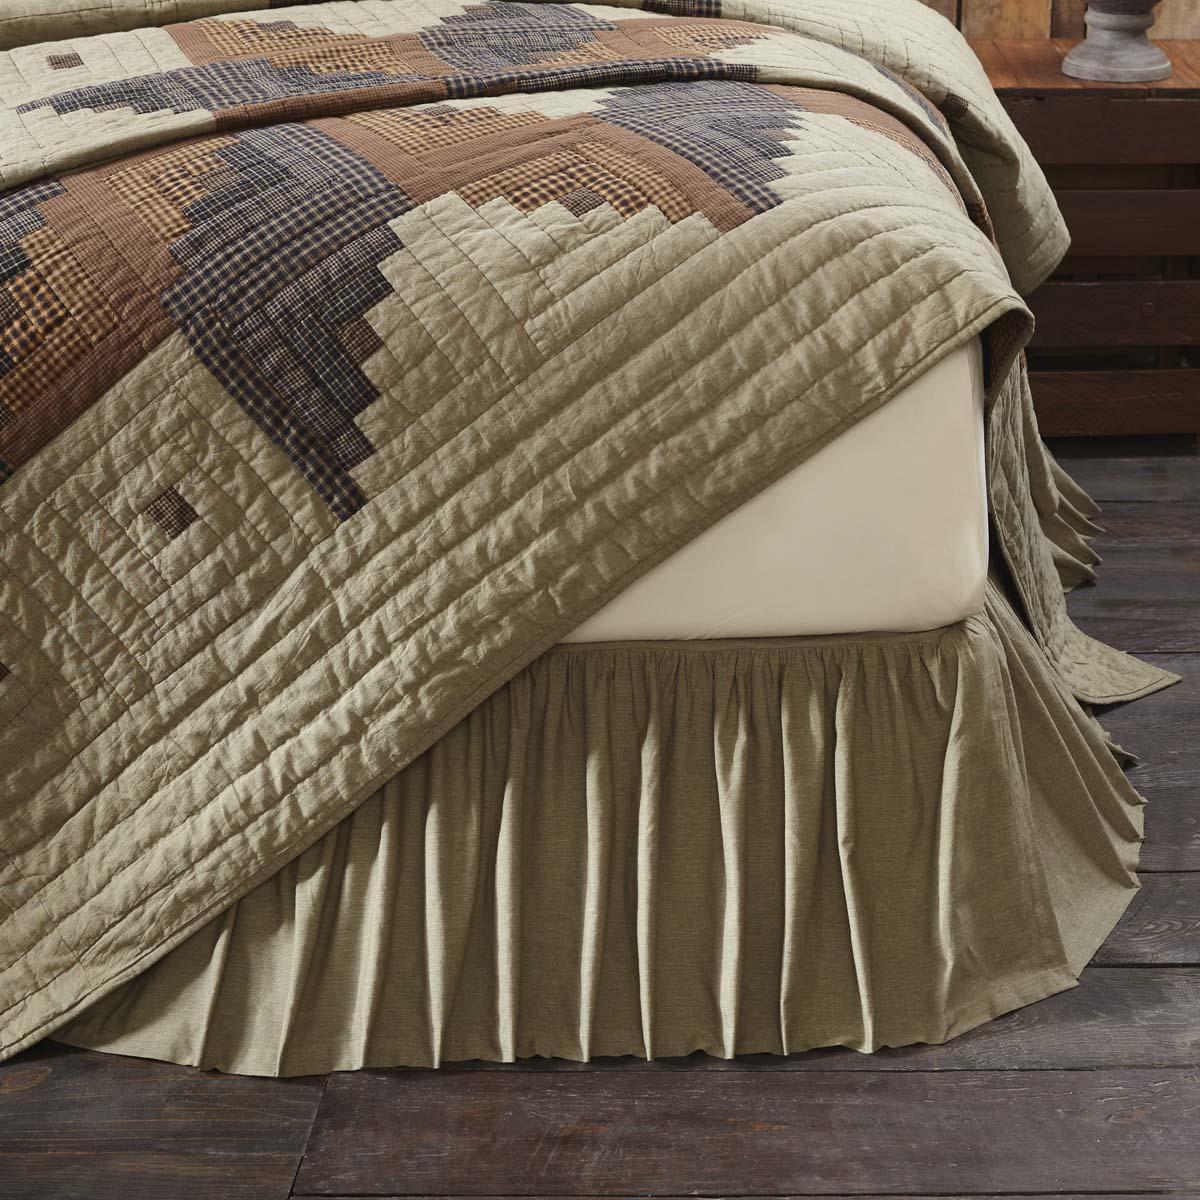 Novak Queen Bed Skirt 60x80x16